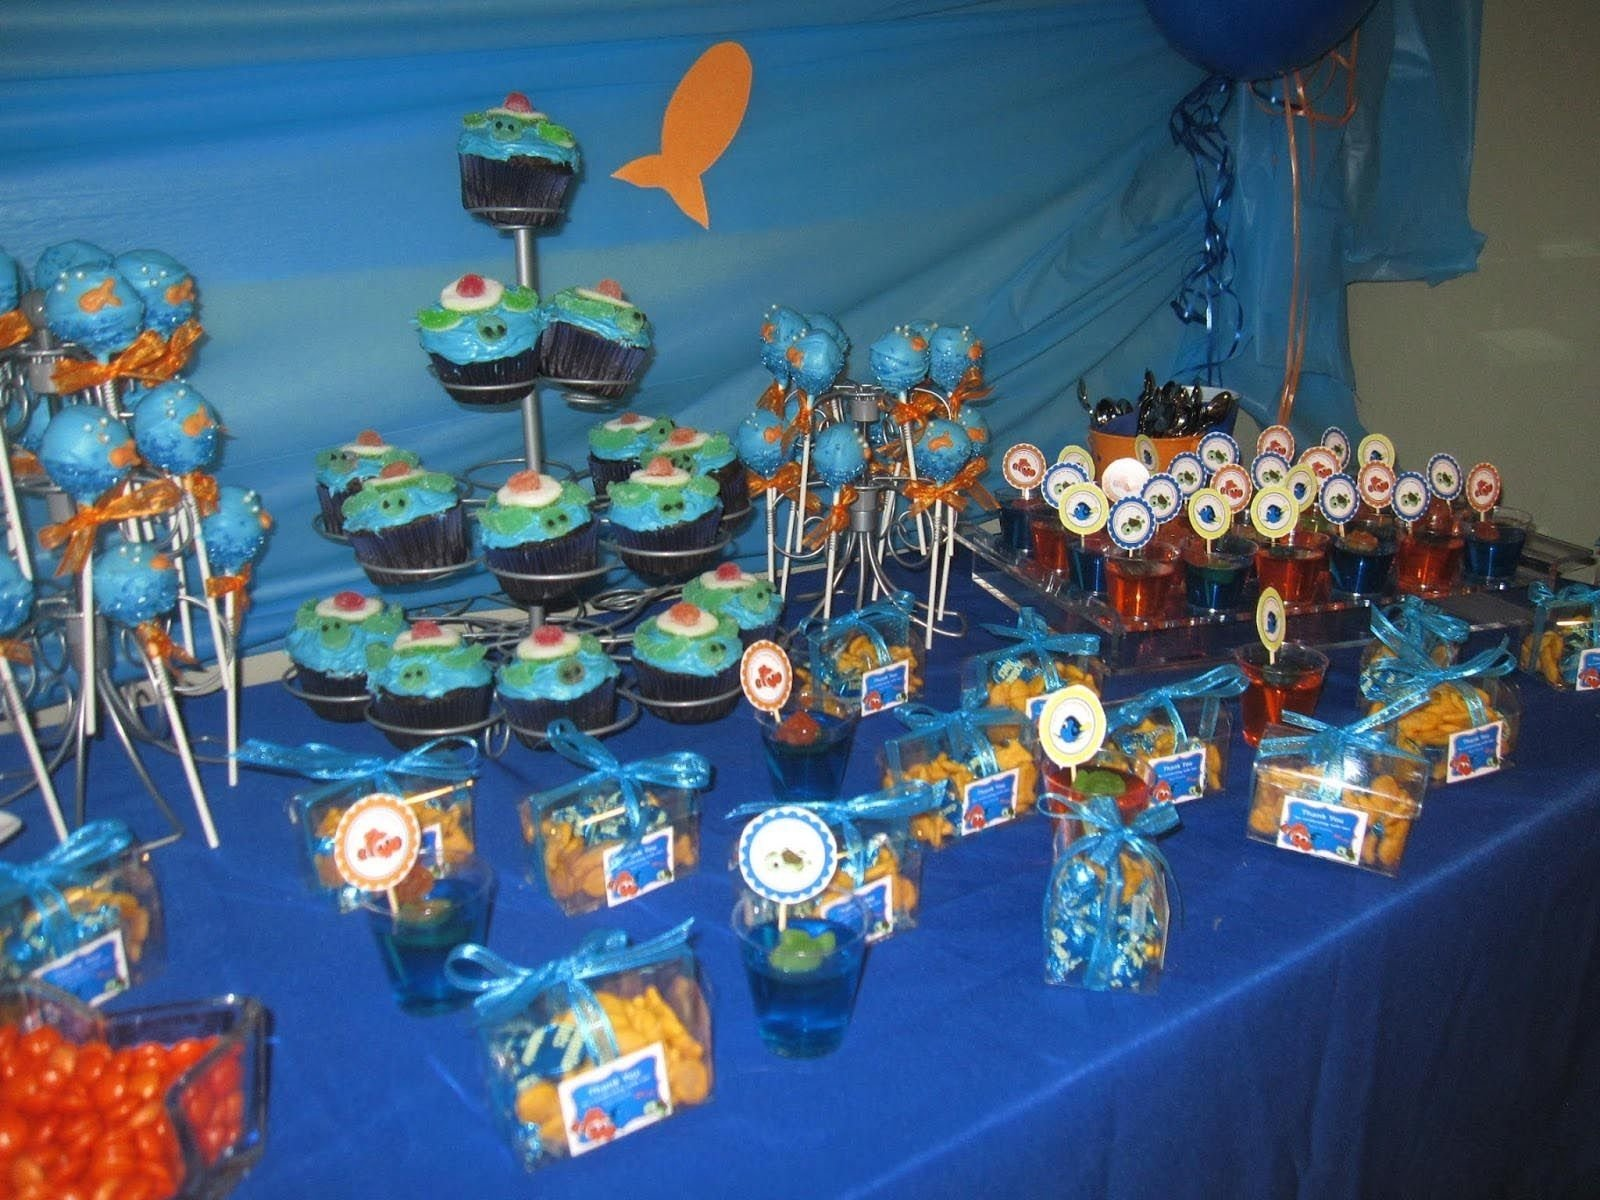 10 Stylish Finding Nemo Birthday Party Ideas finding nemo first birthday party ideas ethan 1st birthday ideas 2020